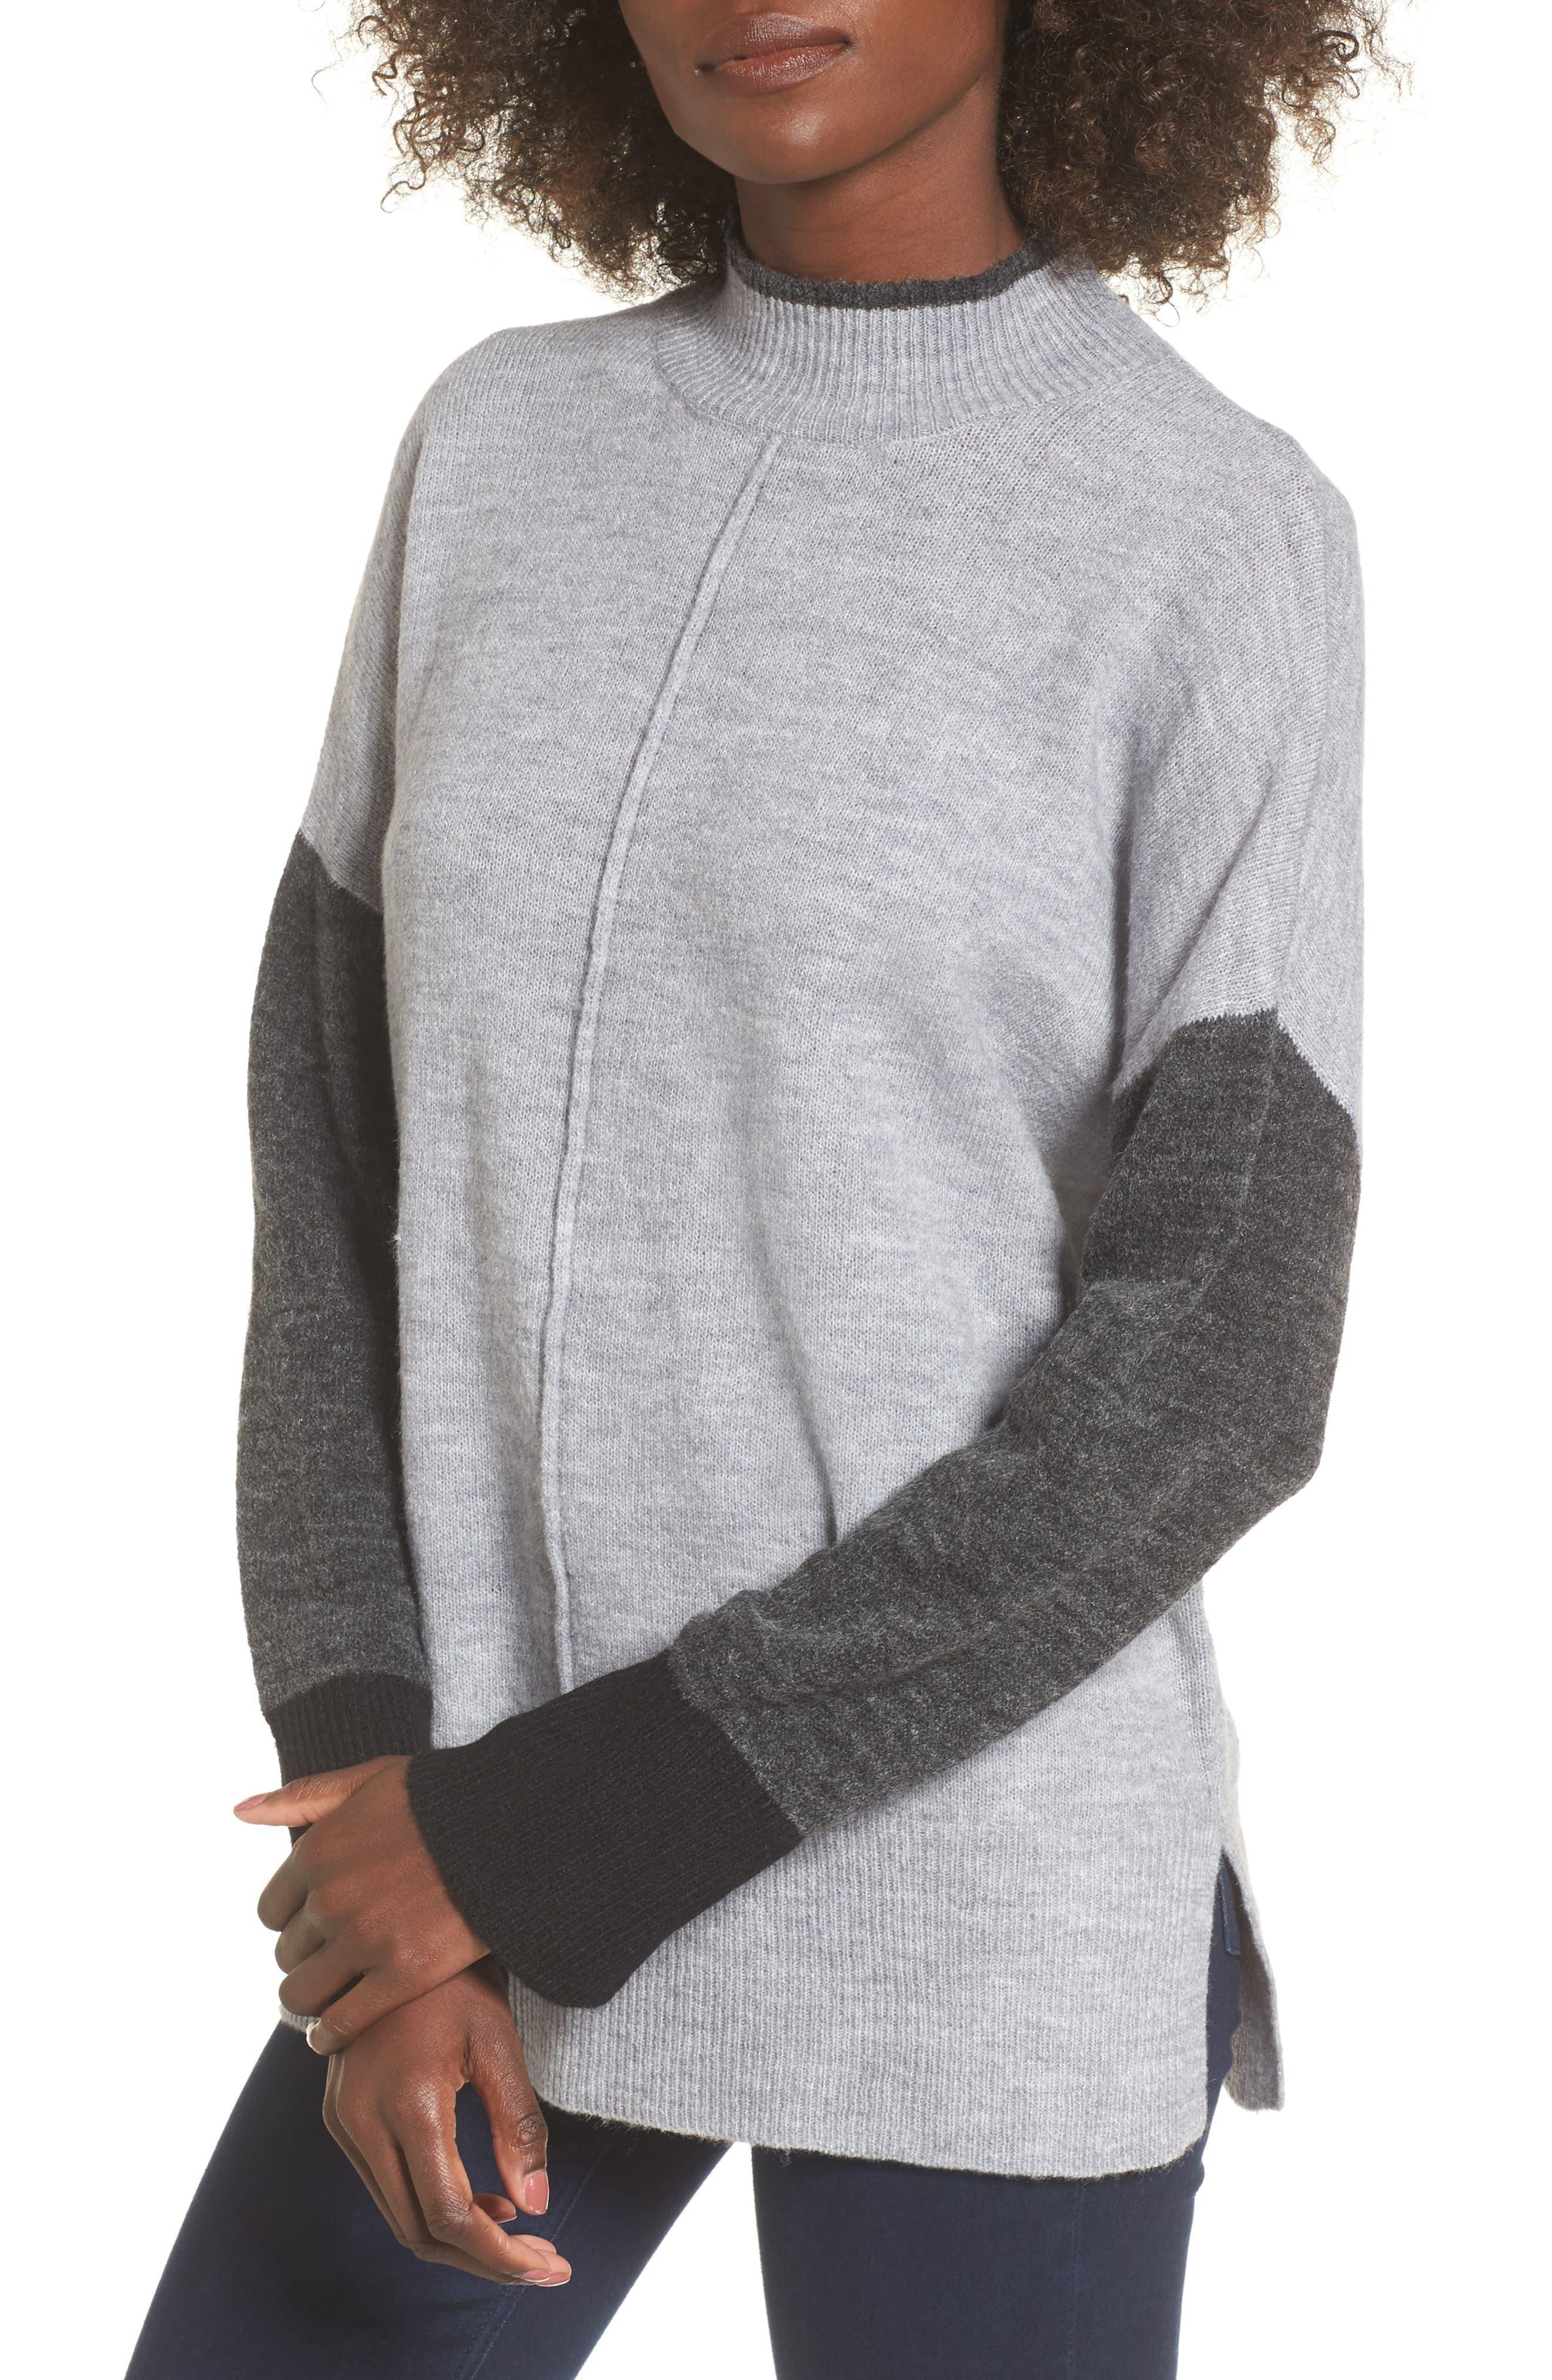 Cotton Emporium Color Block Mock Neck Sweater